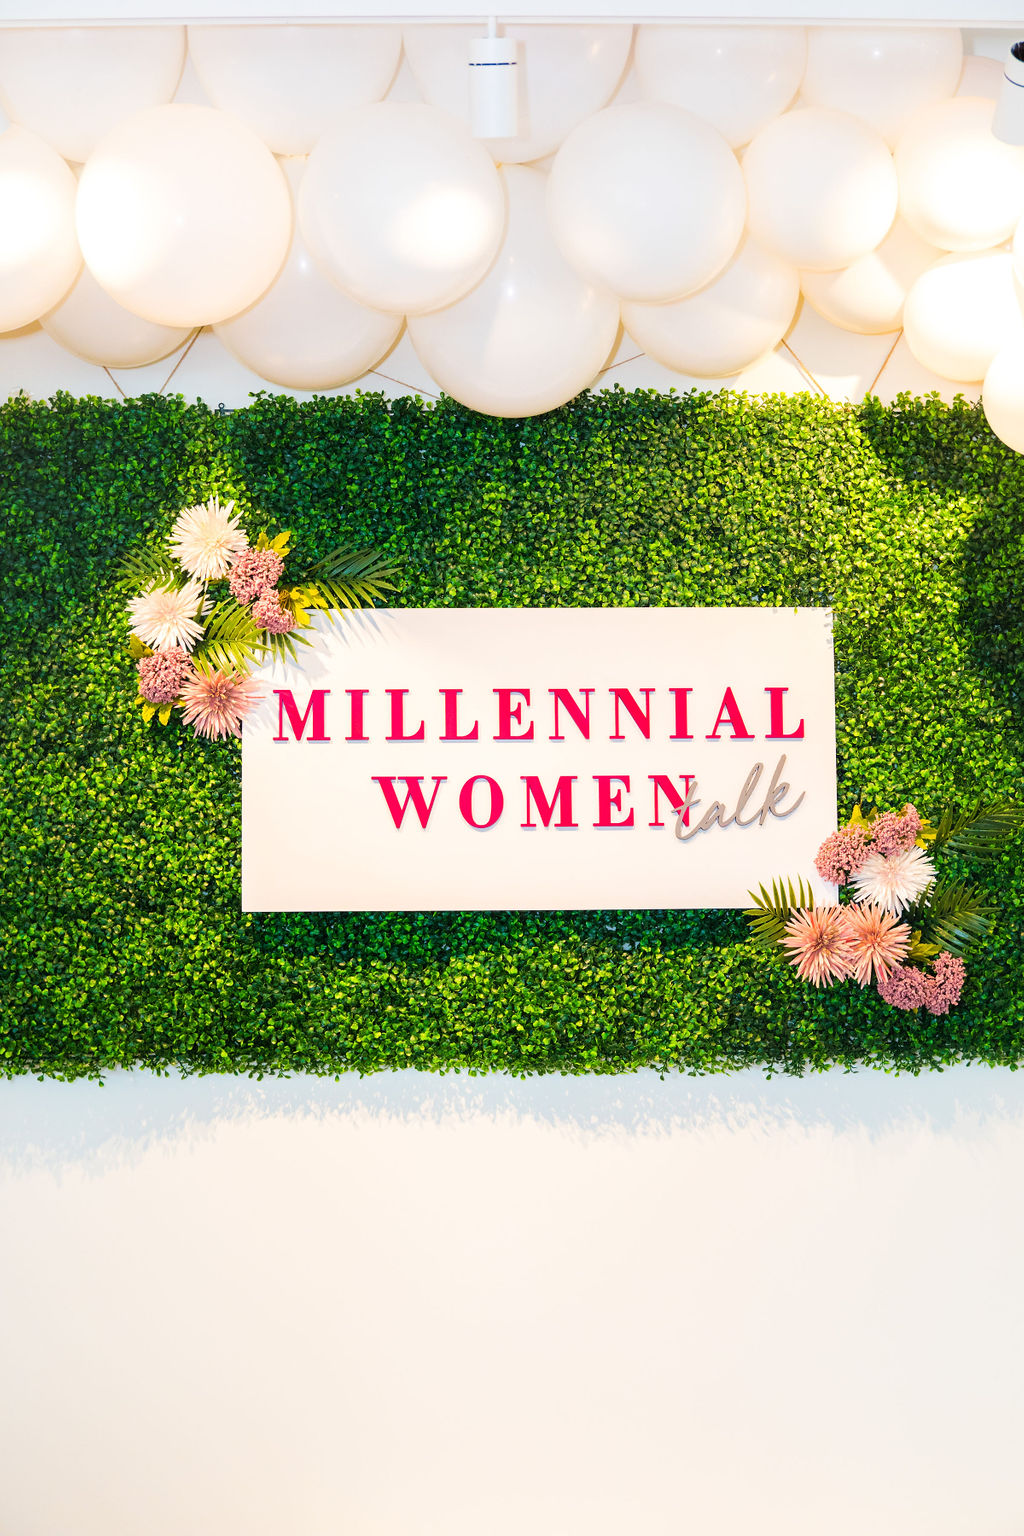 3 Unexpected Lessons From The Millennial Women x Honeypot Talk Tour